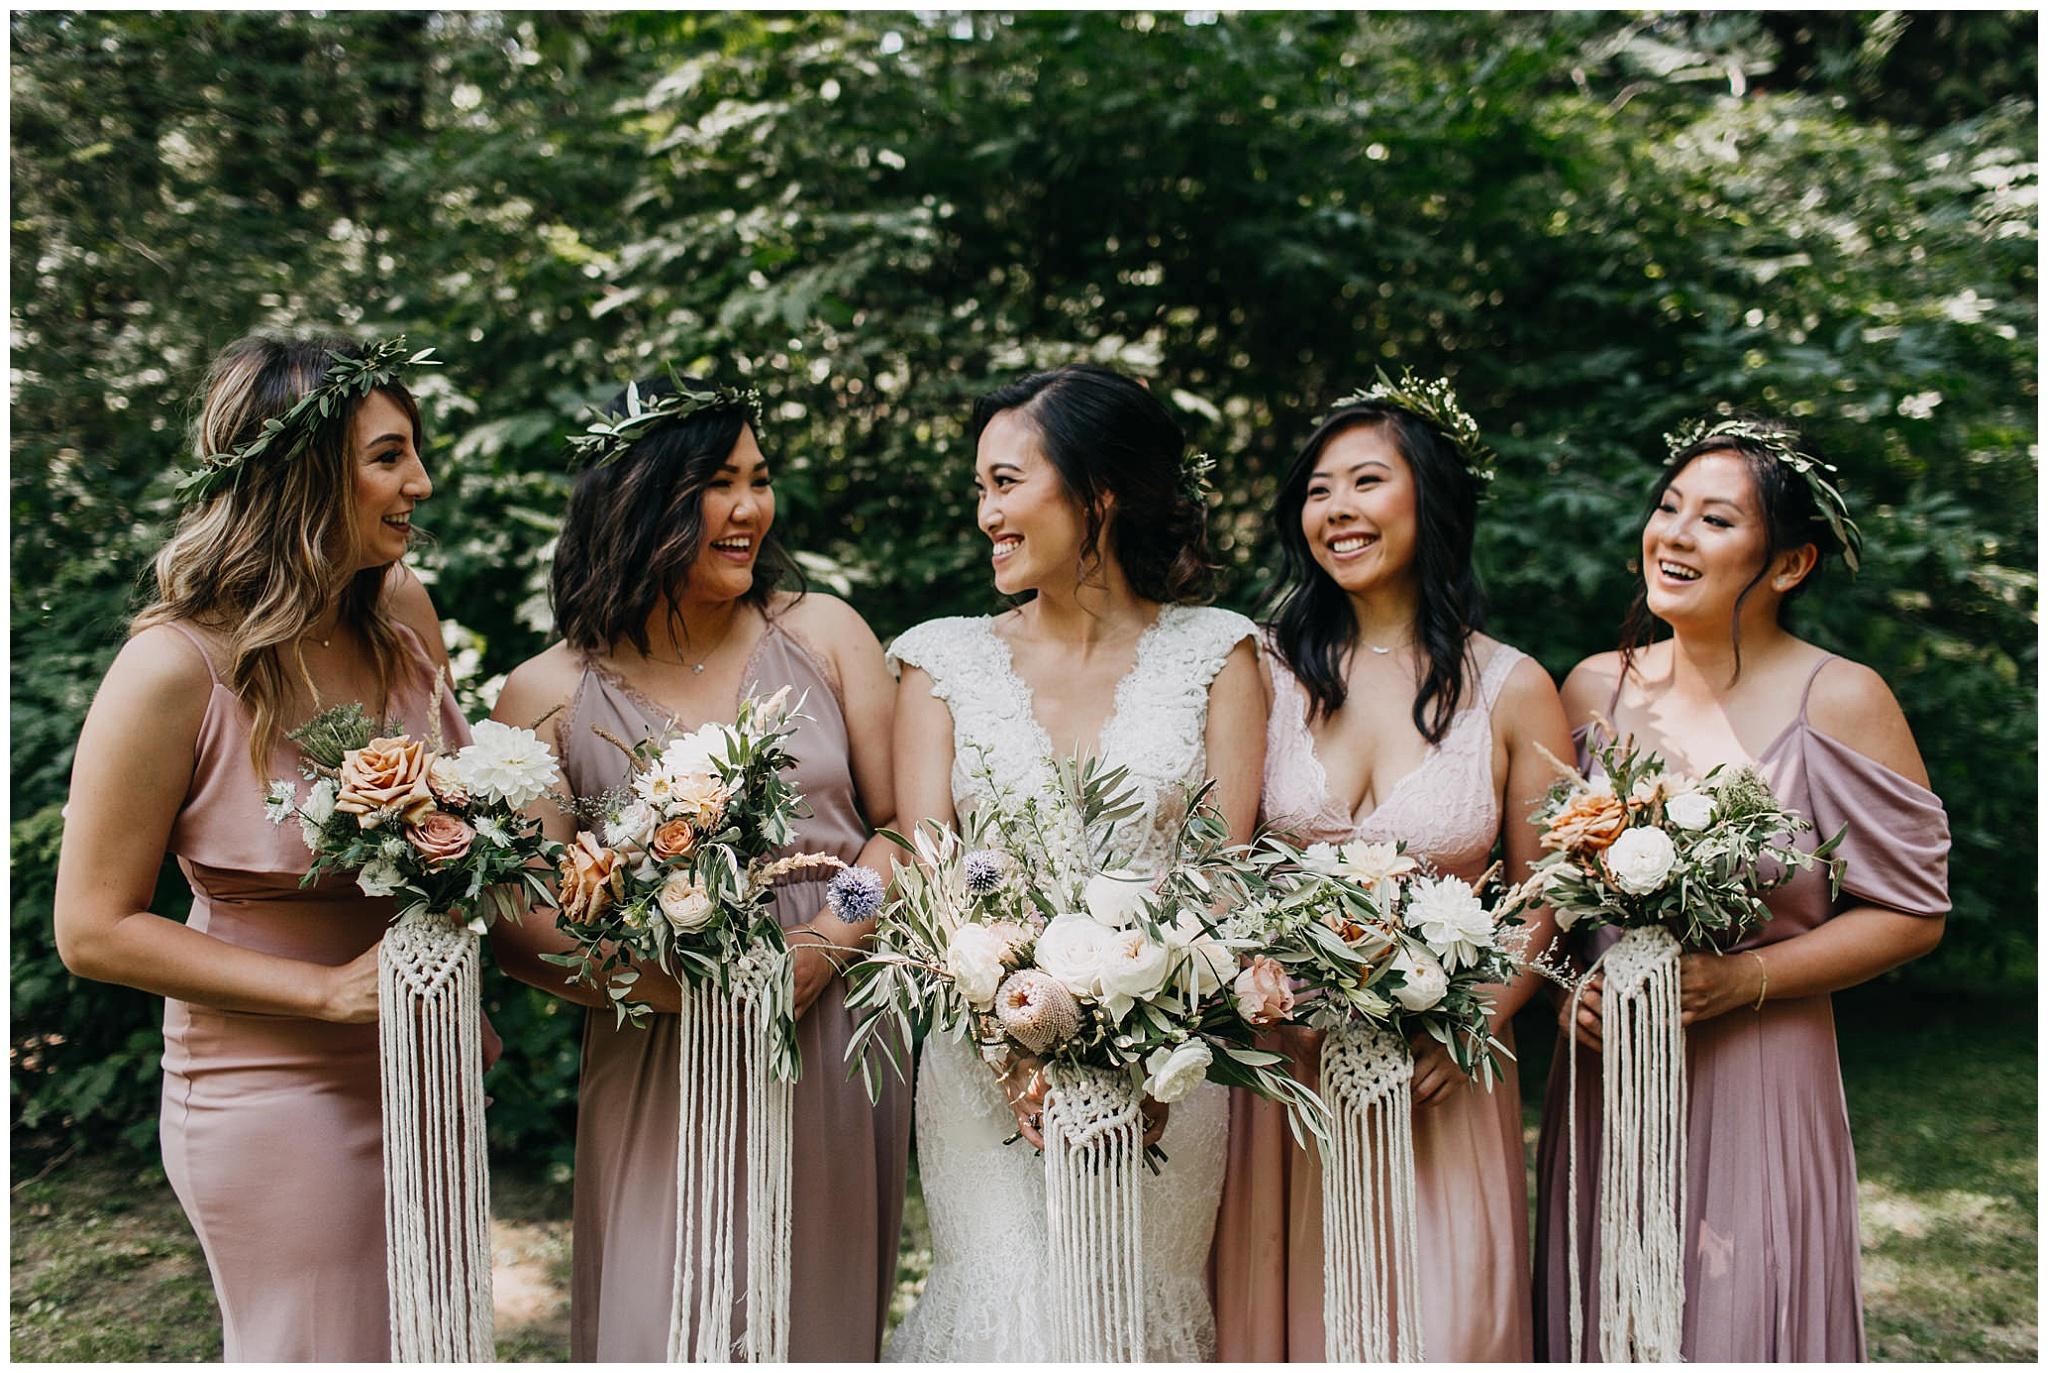 bride and bridesmaids portrait at krause berry farm wedding